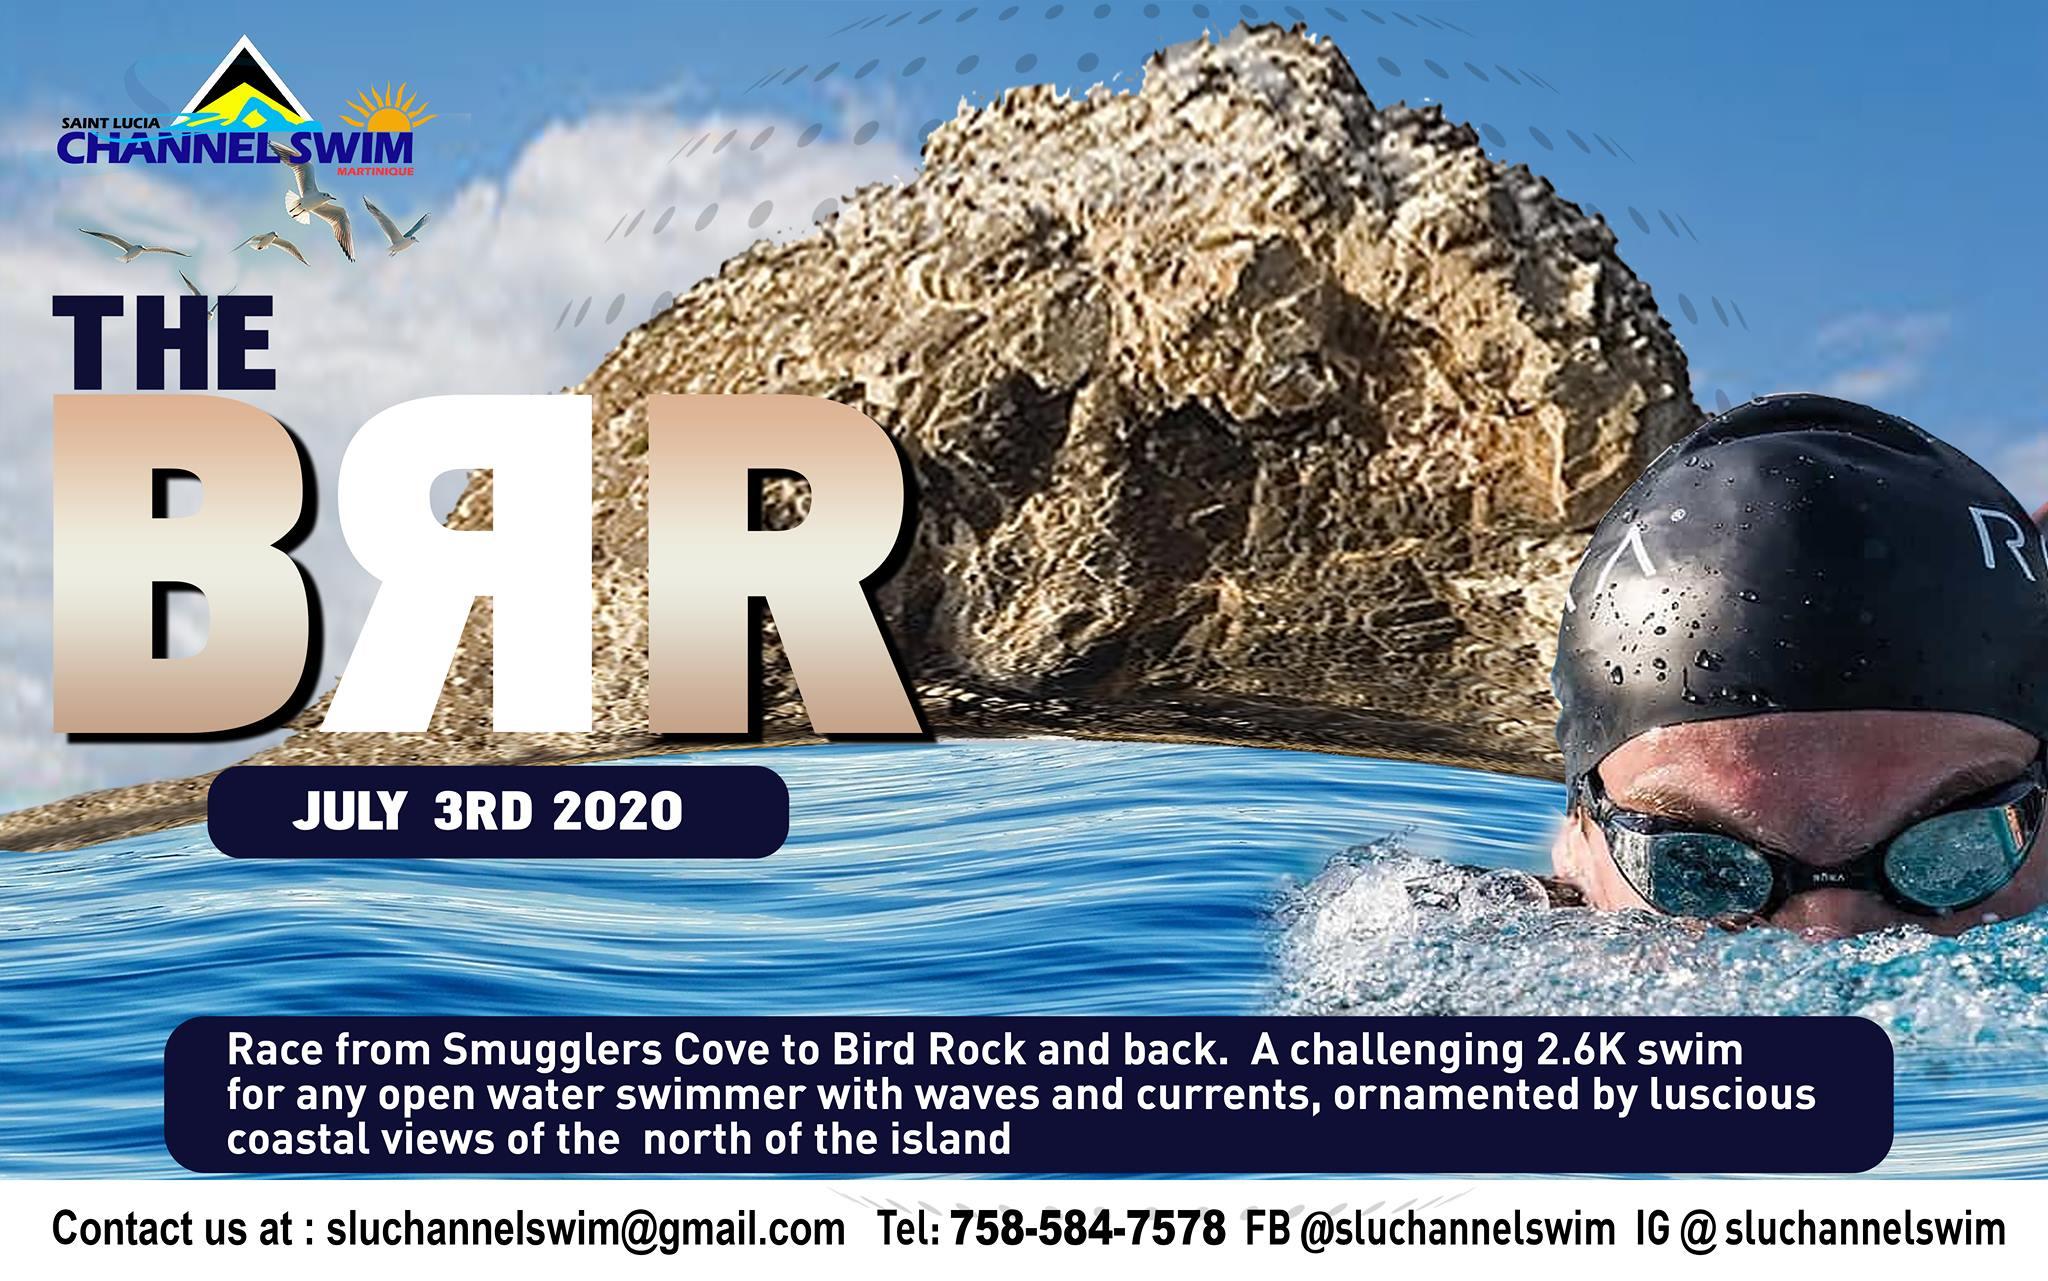 The Brr 2020 2.6k swim challenge